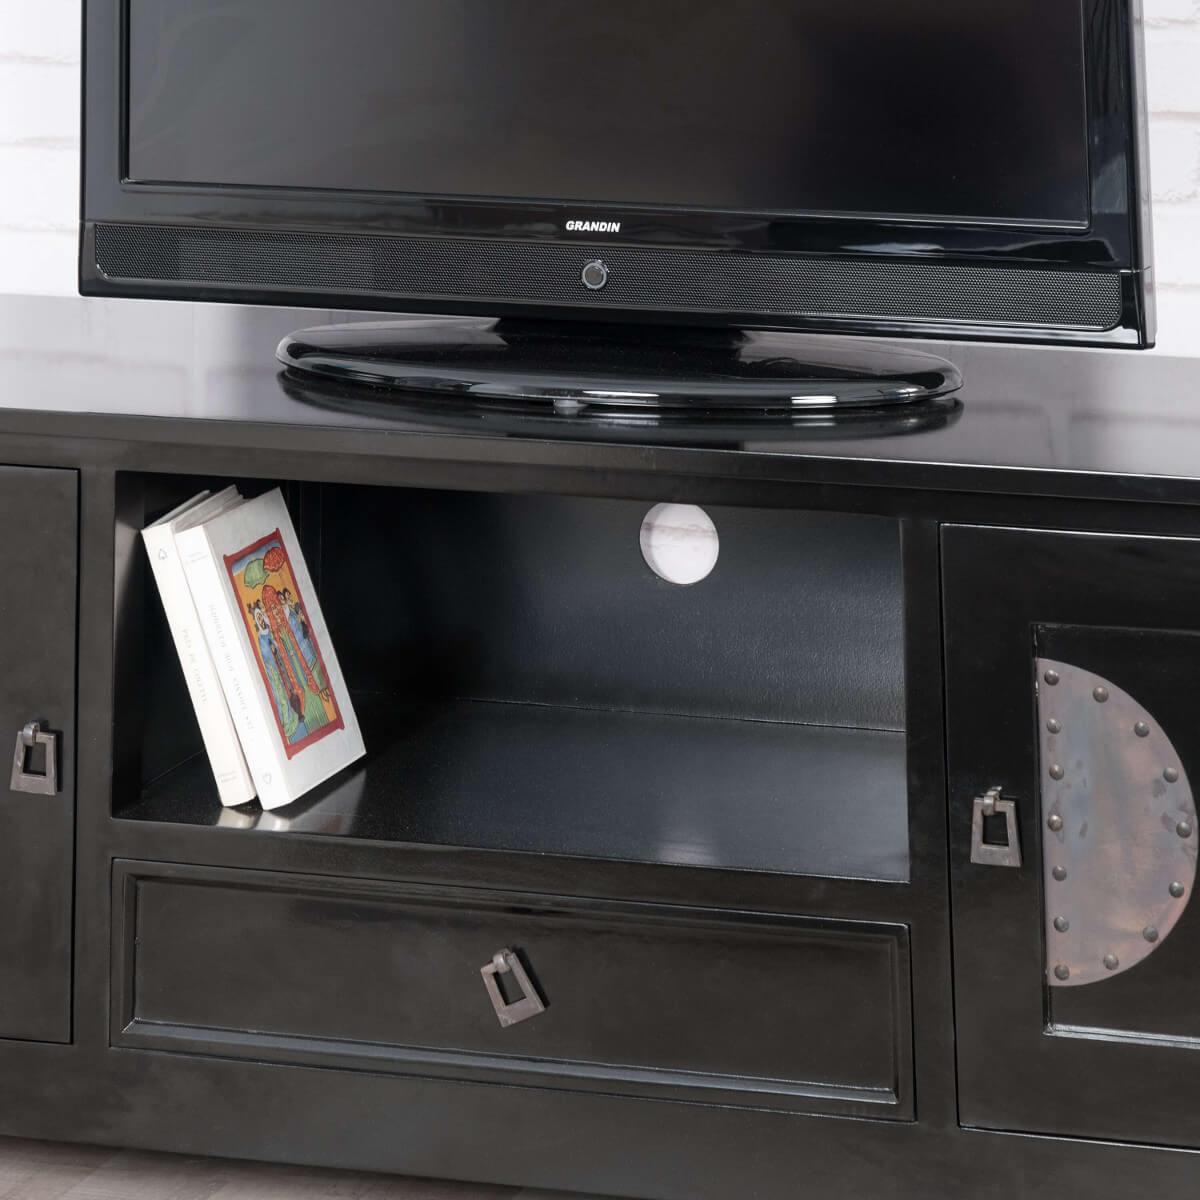 Meuble Tv Noir Meuble Tv Bois Metal Rectangle Acajou Thao 150 Cm # Meuble Tv Noir Bois